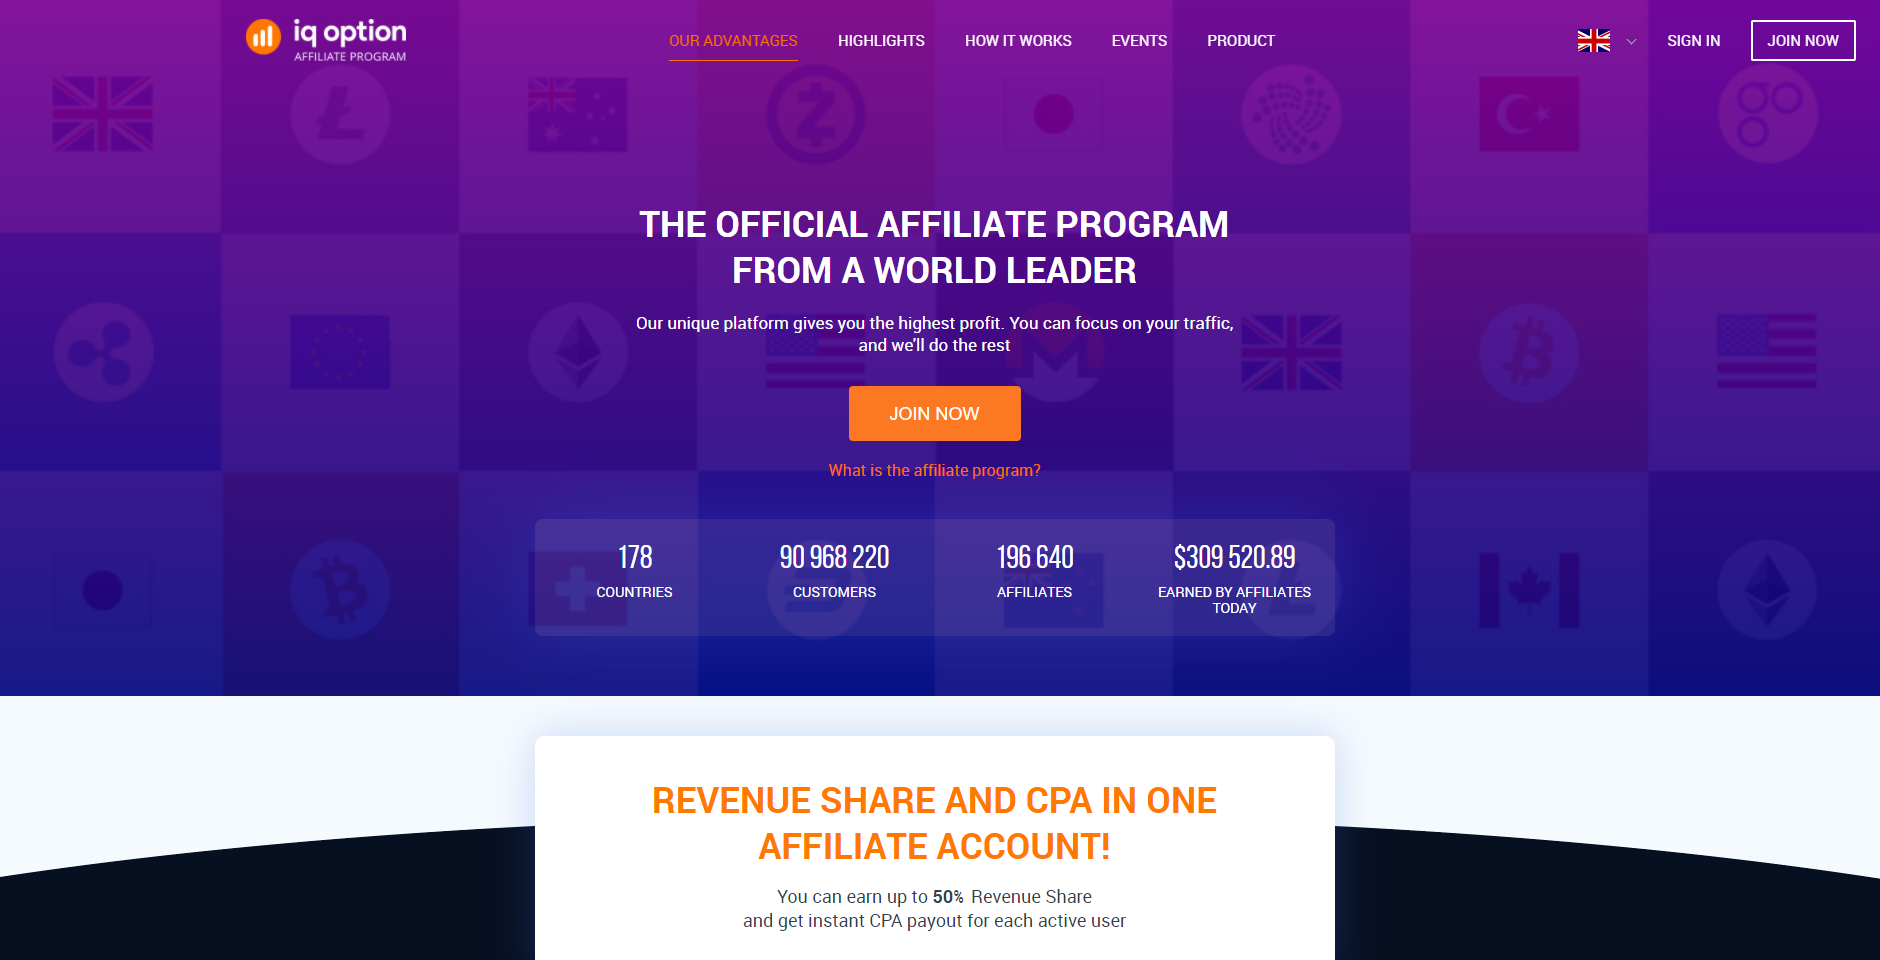 Website of the IQ Option affiliate program